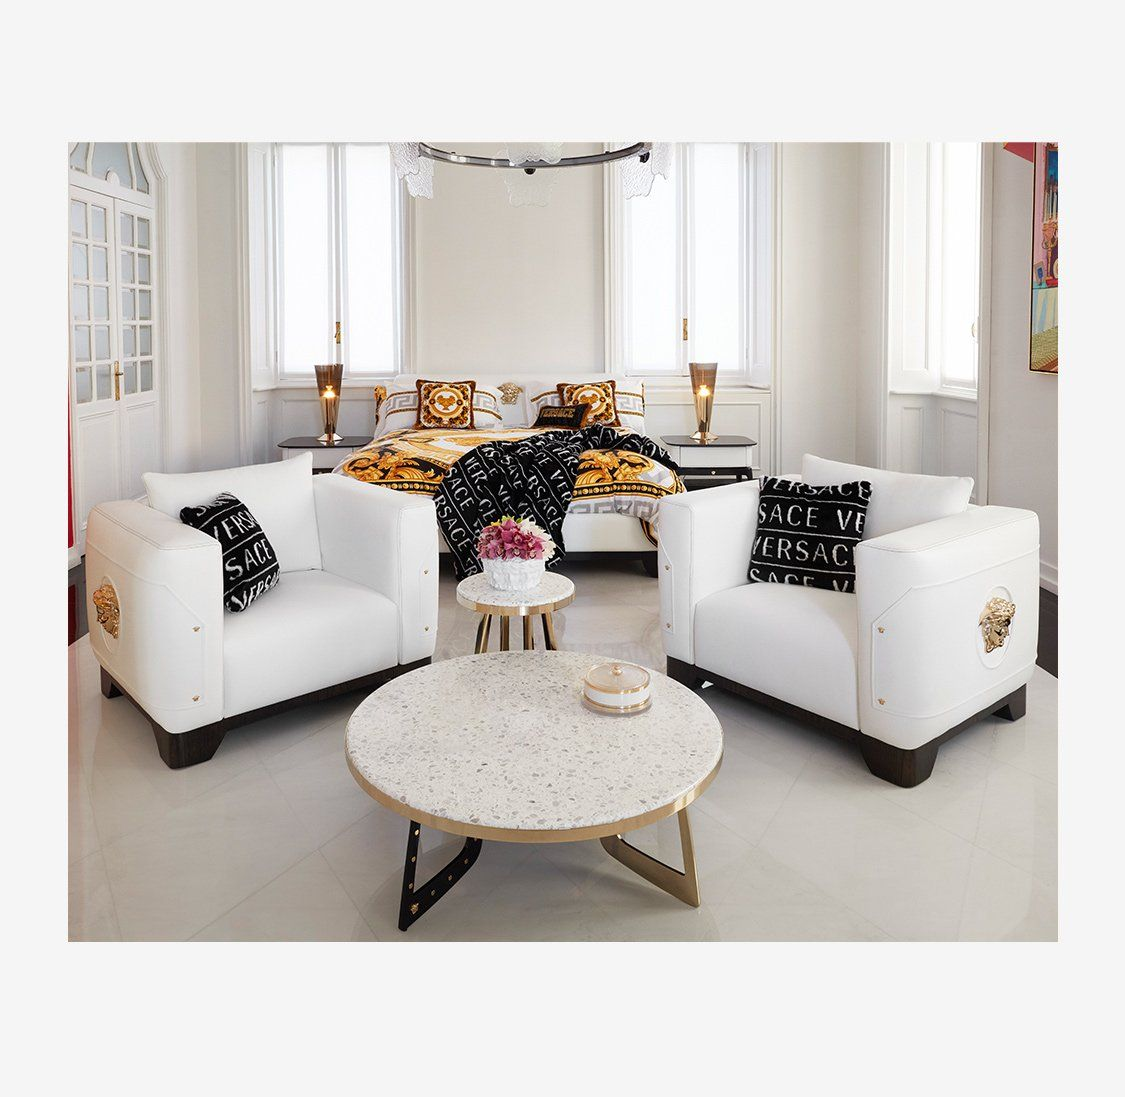 Versace Furniture Versace Furniture Living Room Sets Furniture